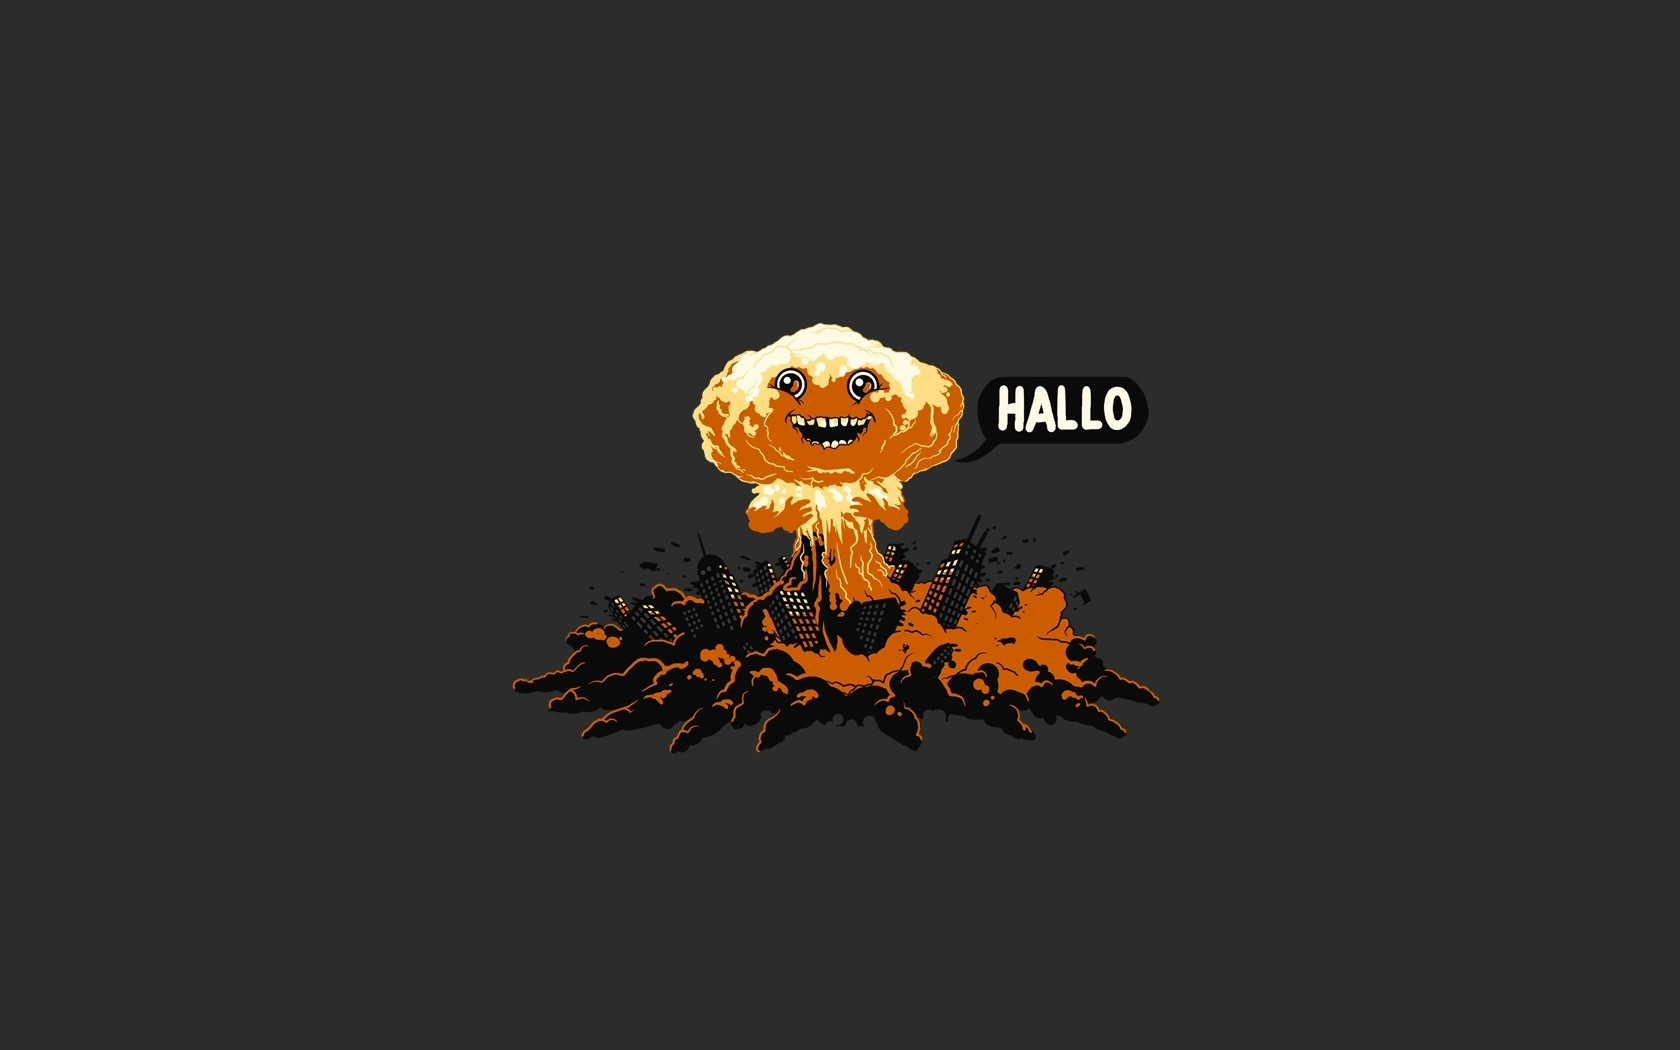 simple background minimalism apocalyptic dark humor humor